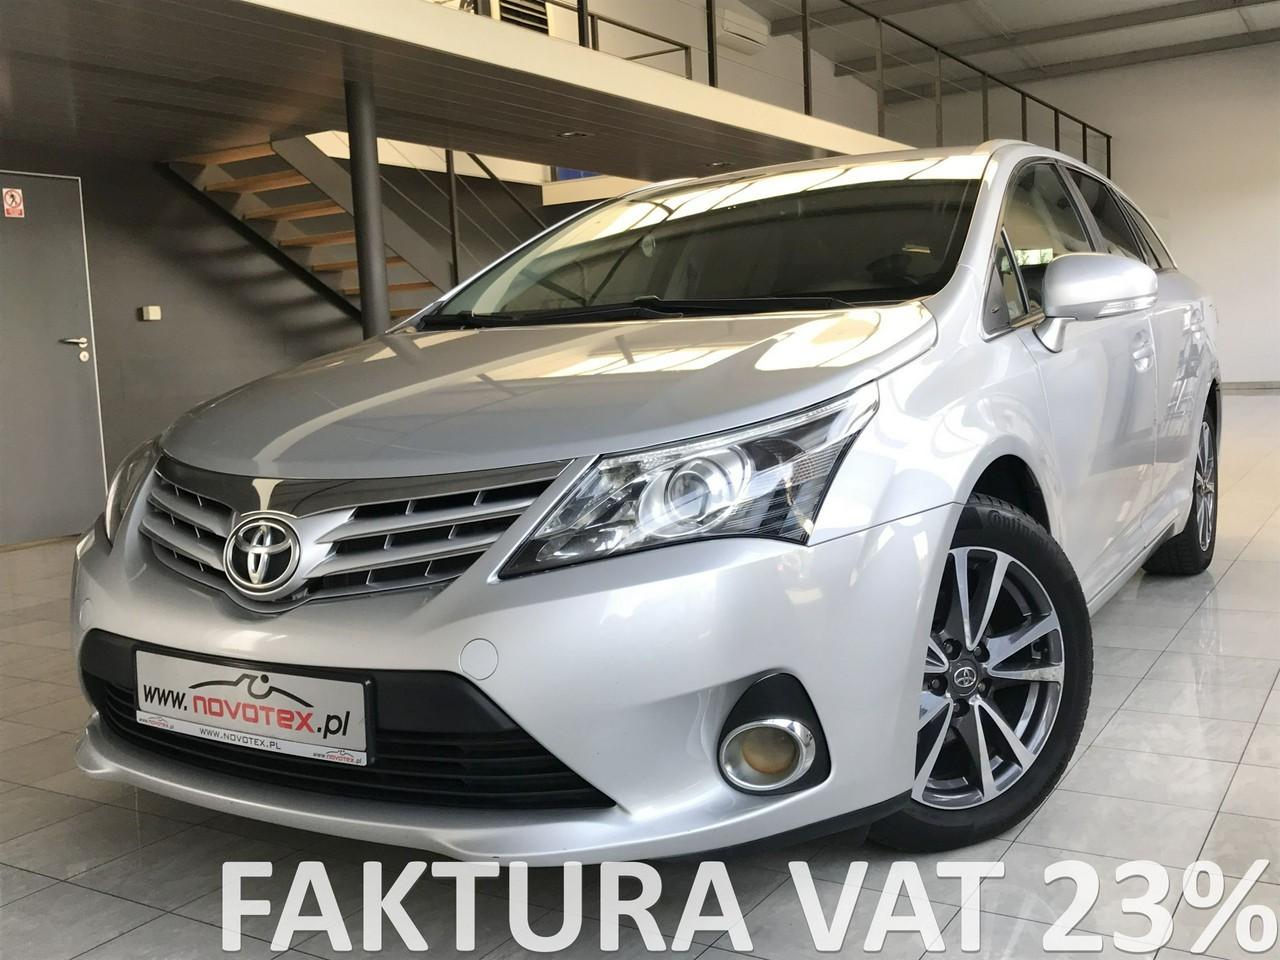 Toyota Avensis 2.0D-4D*Sol*navi*alu 17 cali*bezwypadek*serwis w ASO*Gwarancja VIP